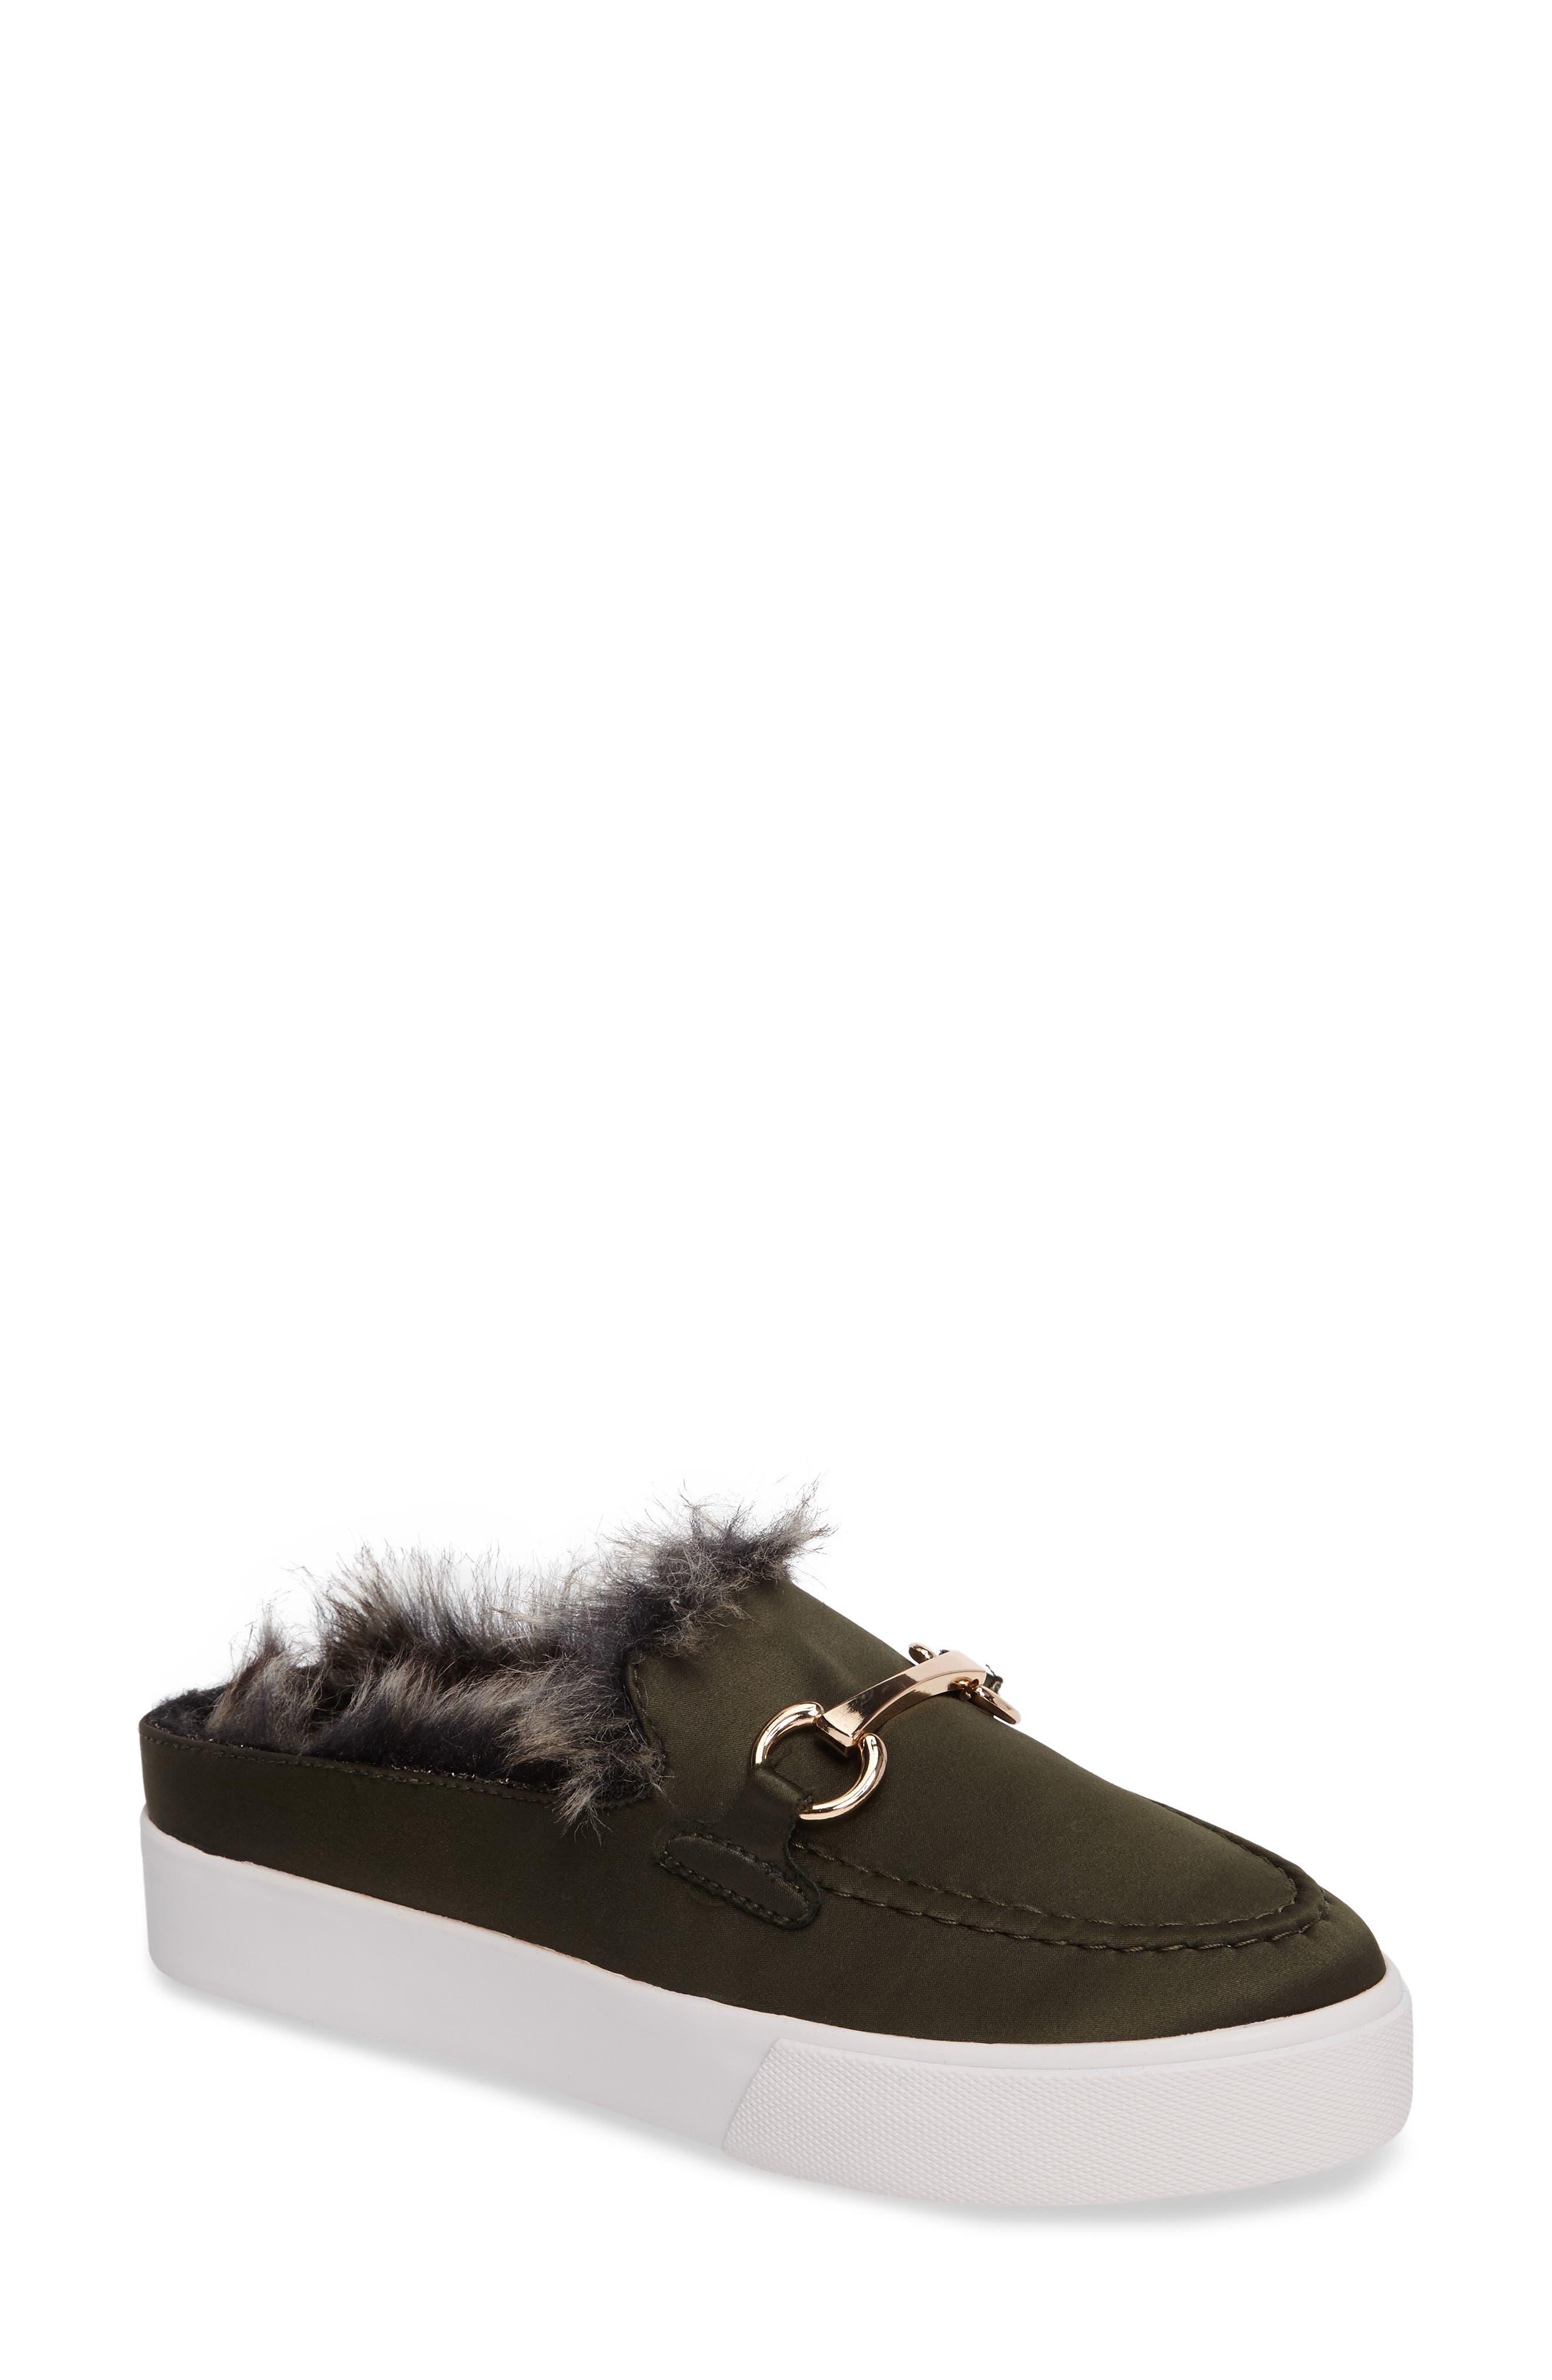 Tico Faux Fur Sneaker Mule,                             Main thumbnail 1, color,                             Olive Satin-Gold-Grey